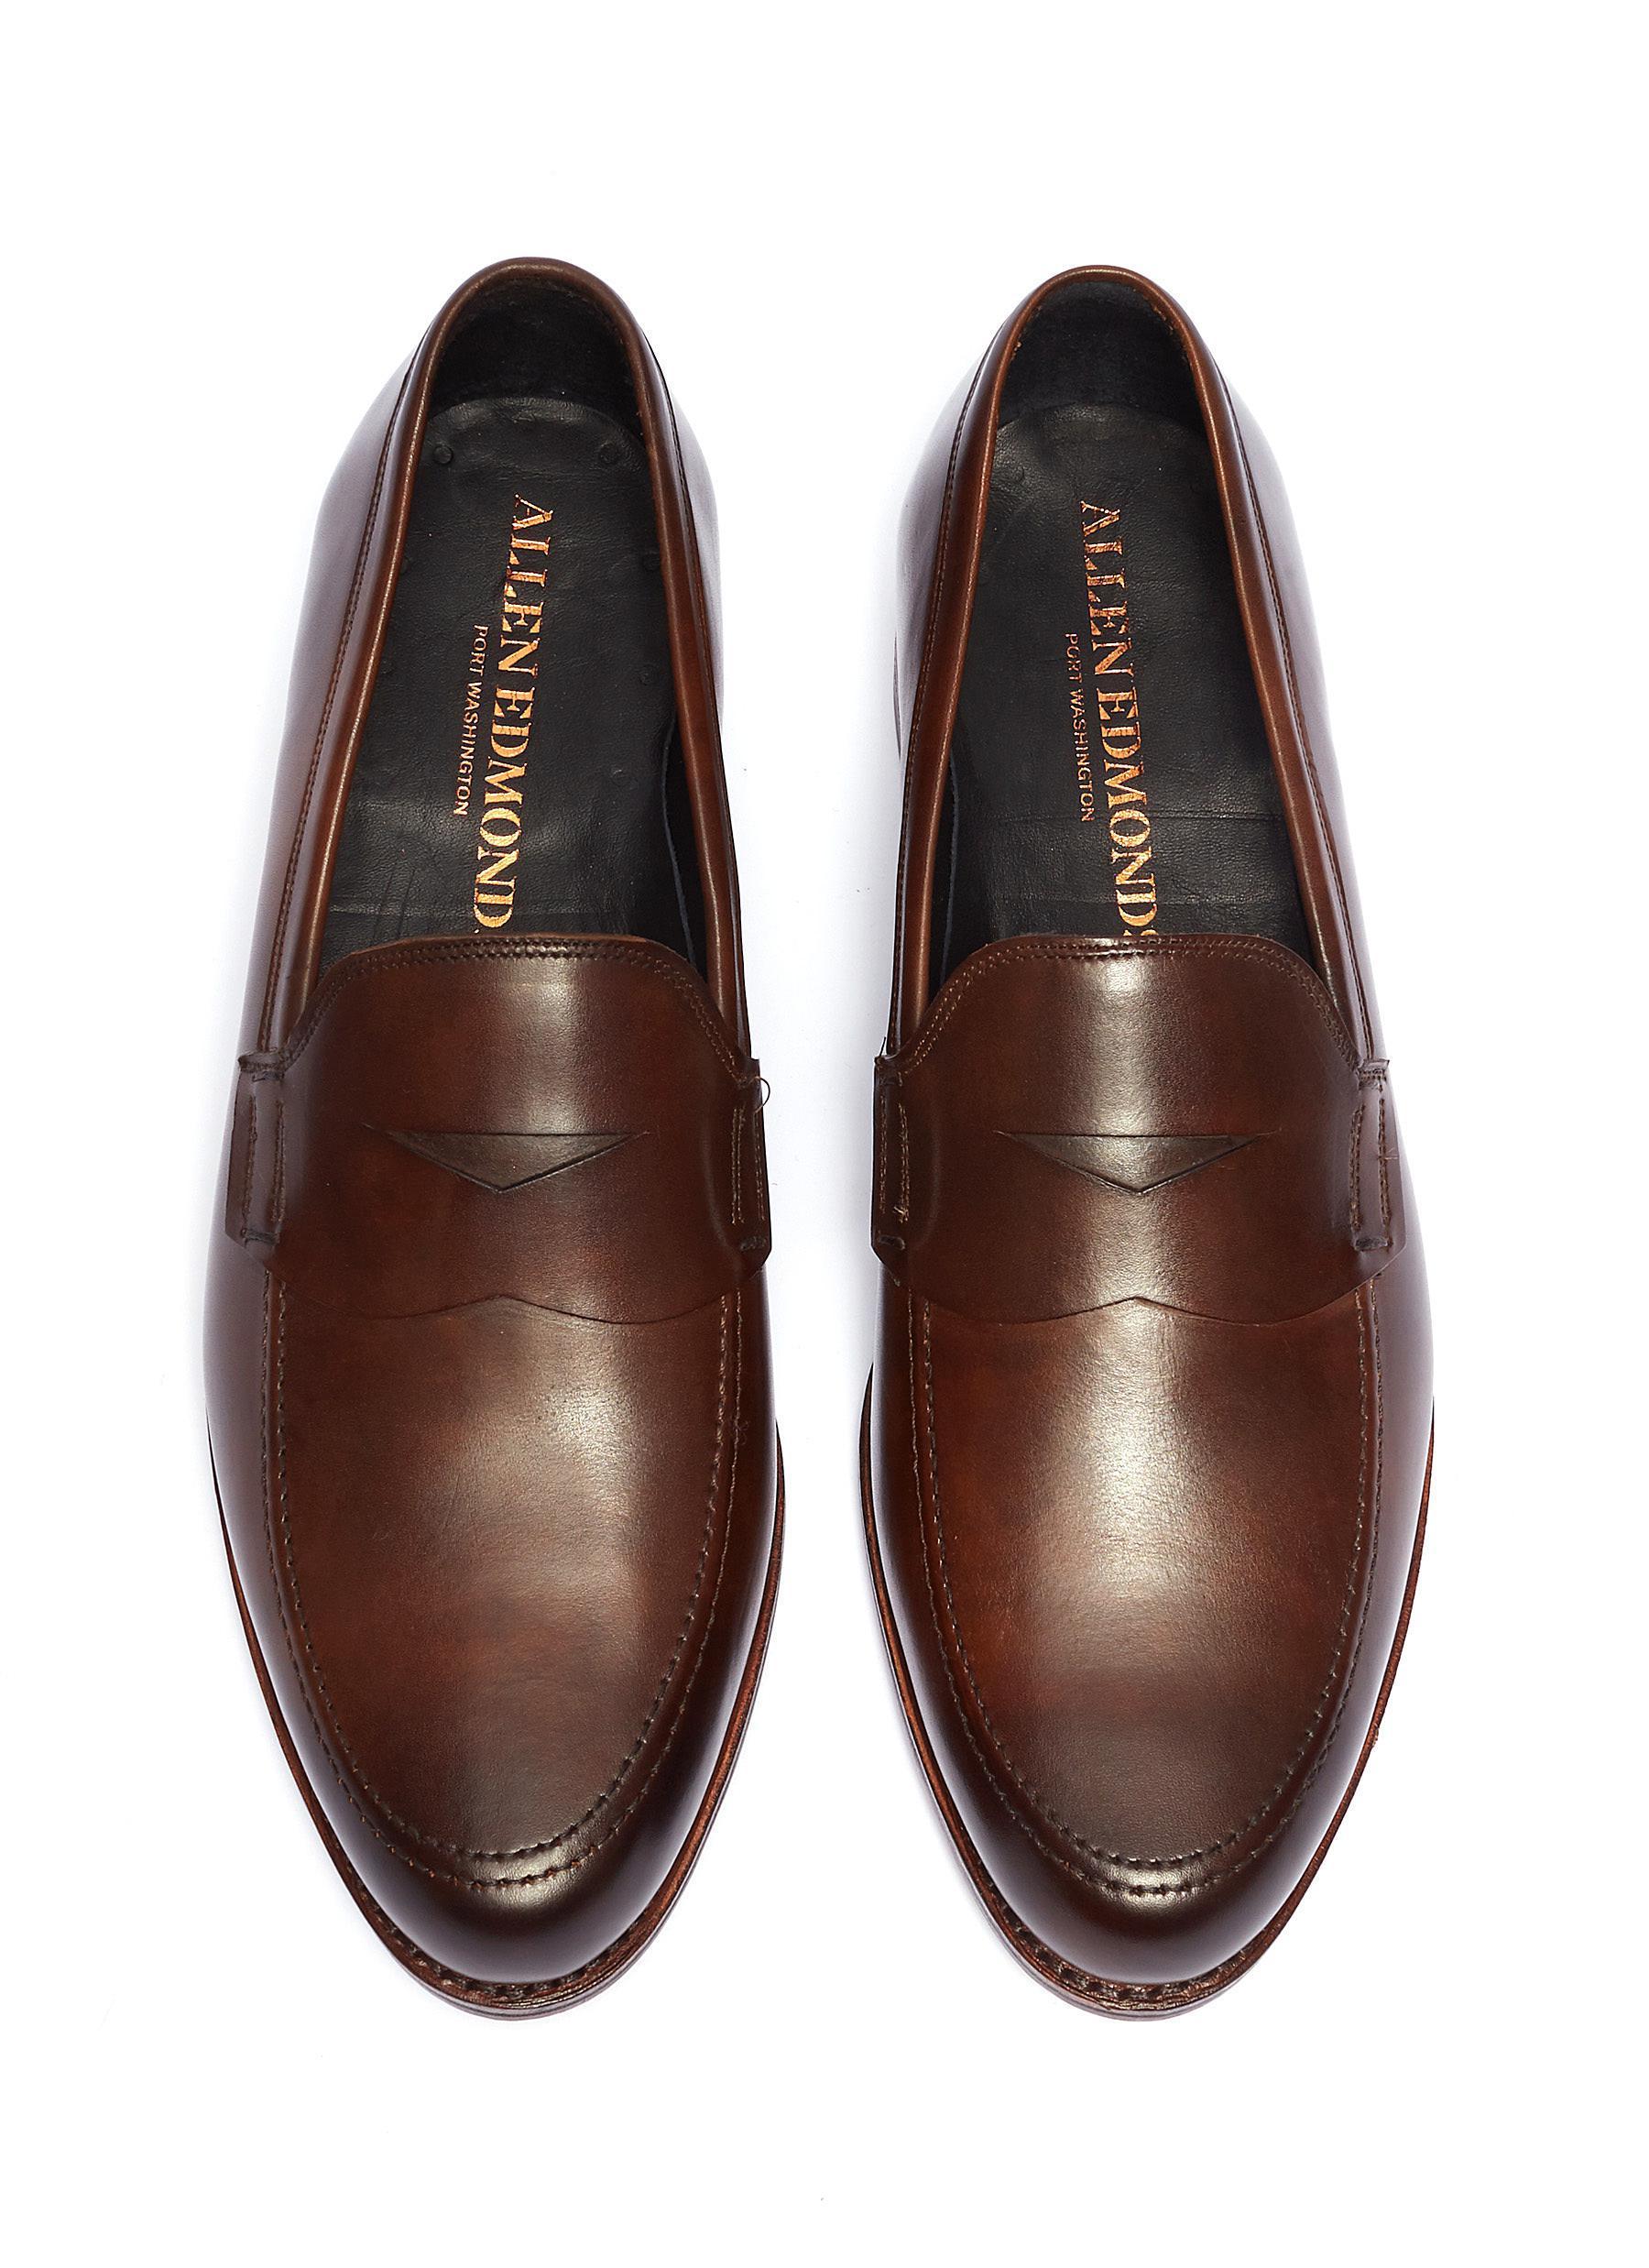 9ca9fbc2e03 Allen Edmonds - Brown  wooster Street  Leather Penny Loafers for Men -  Lyst. View fullscreen